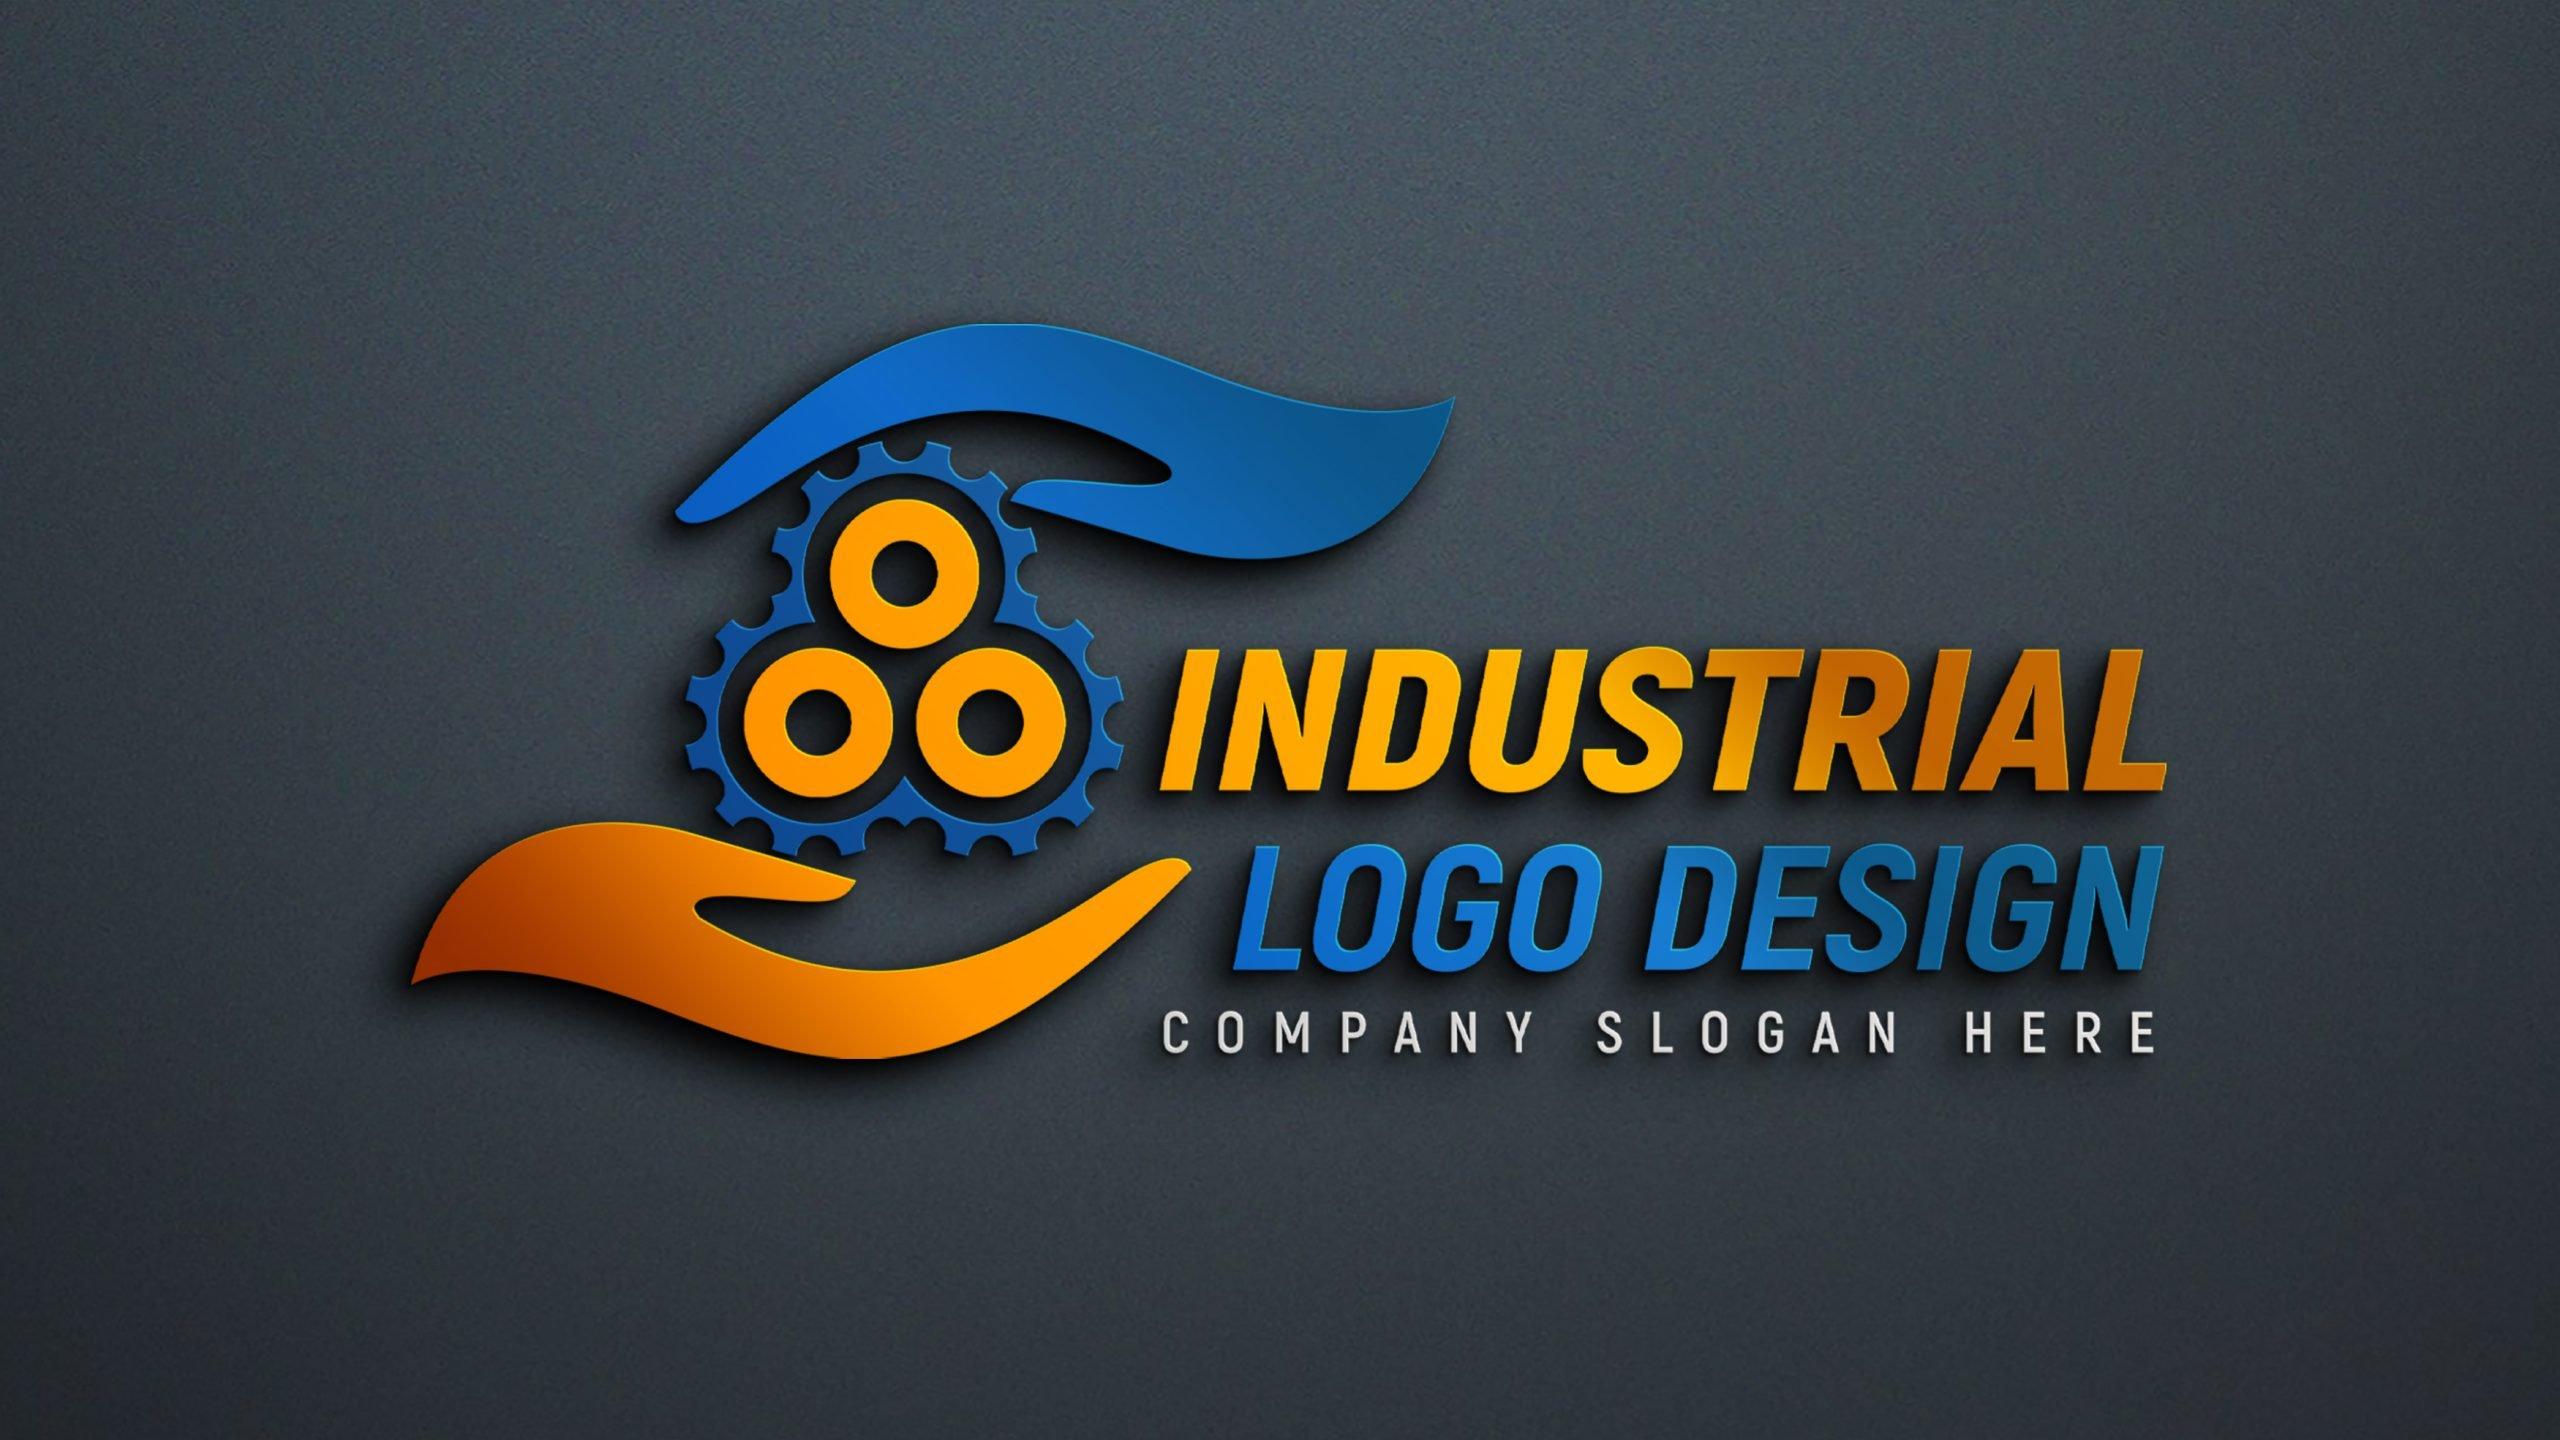 Editable Industrial Logo Design Download